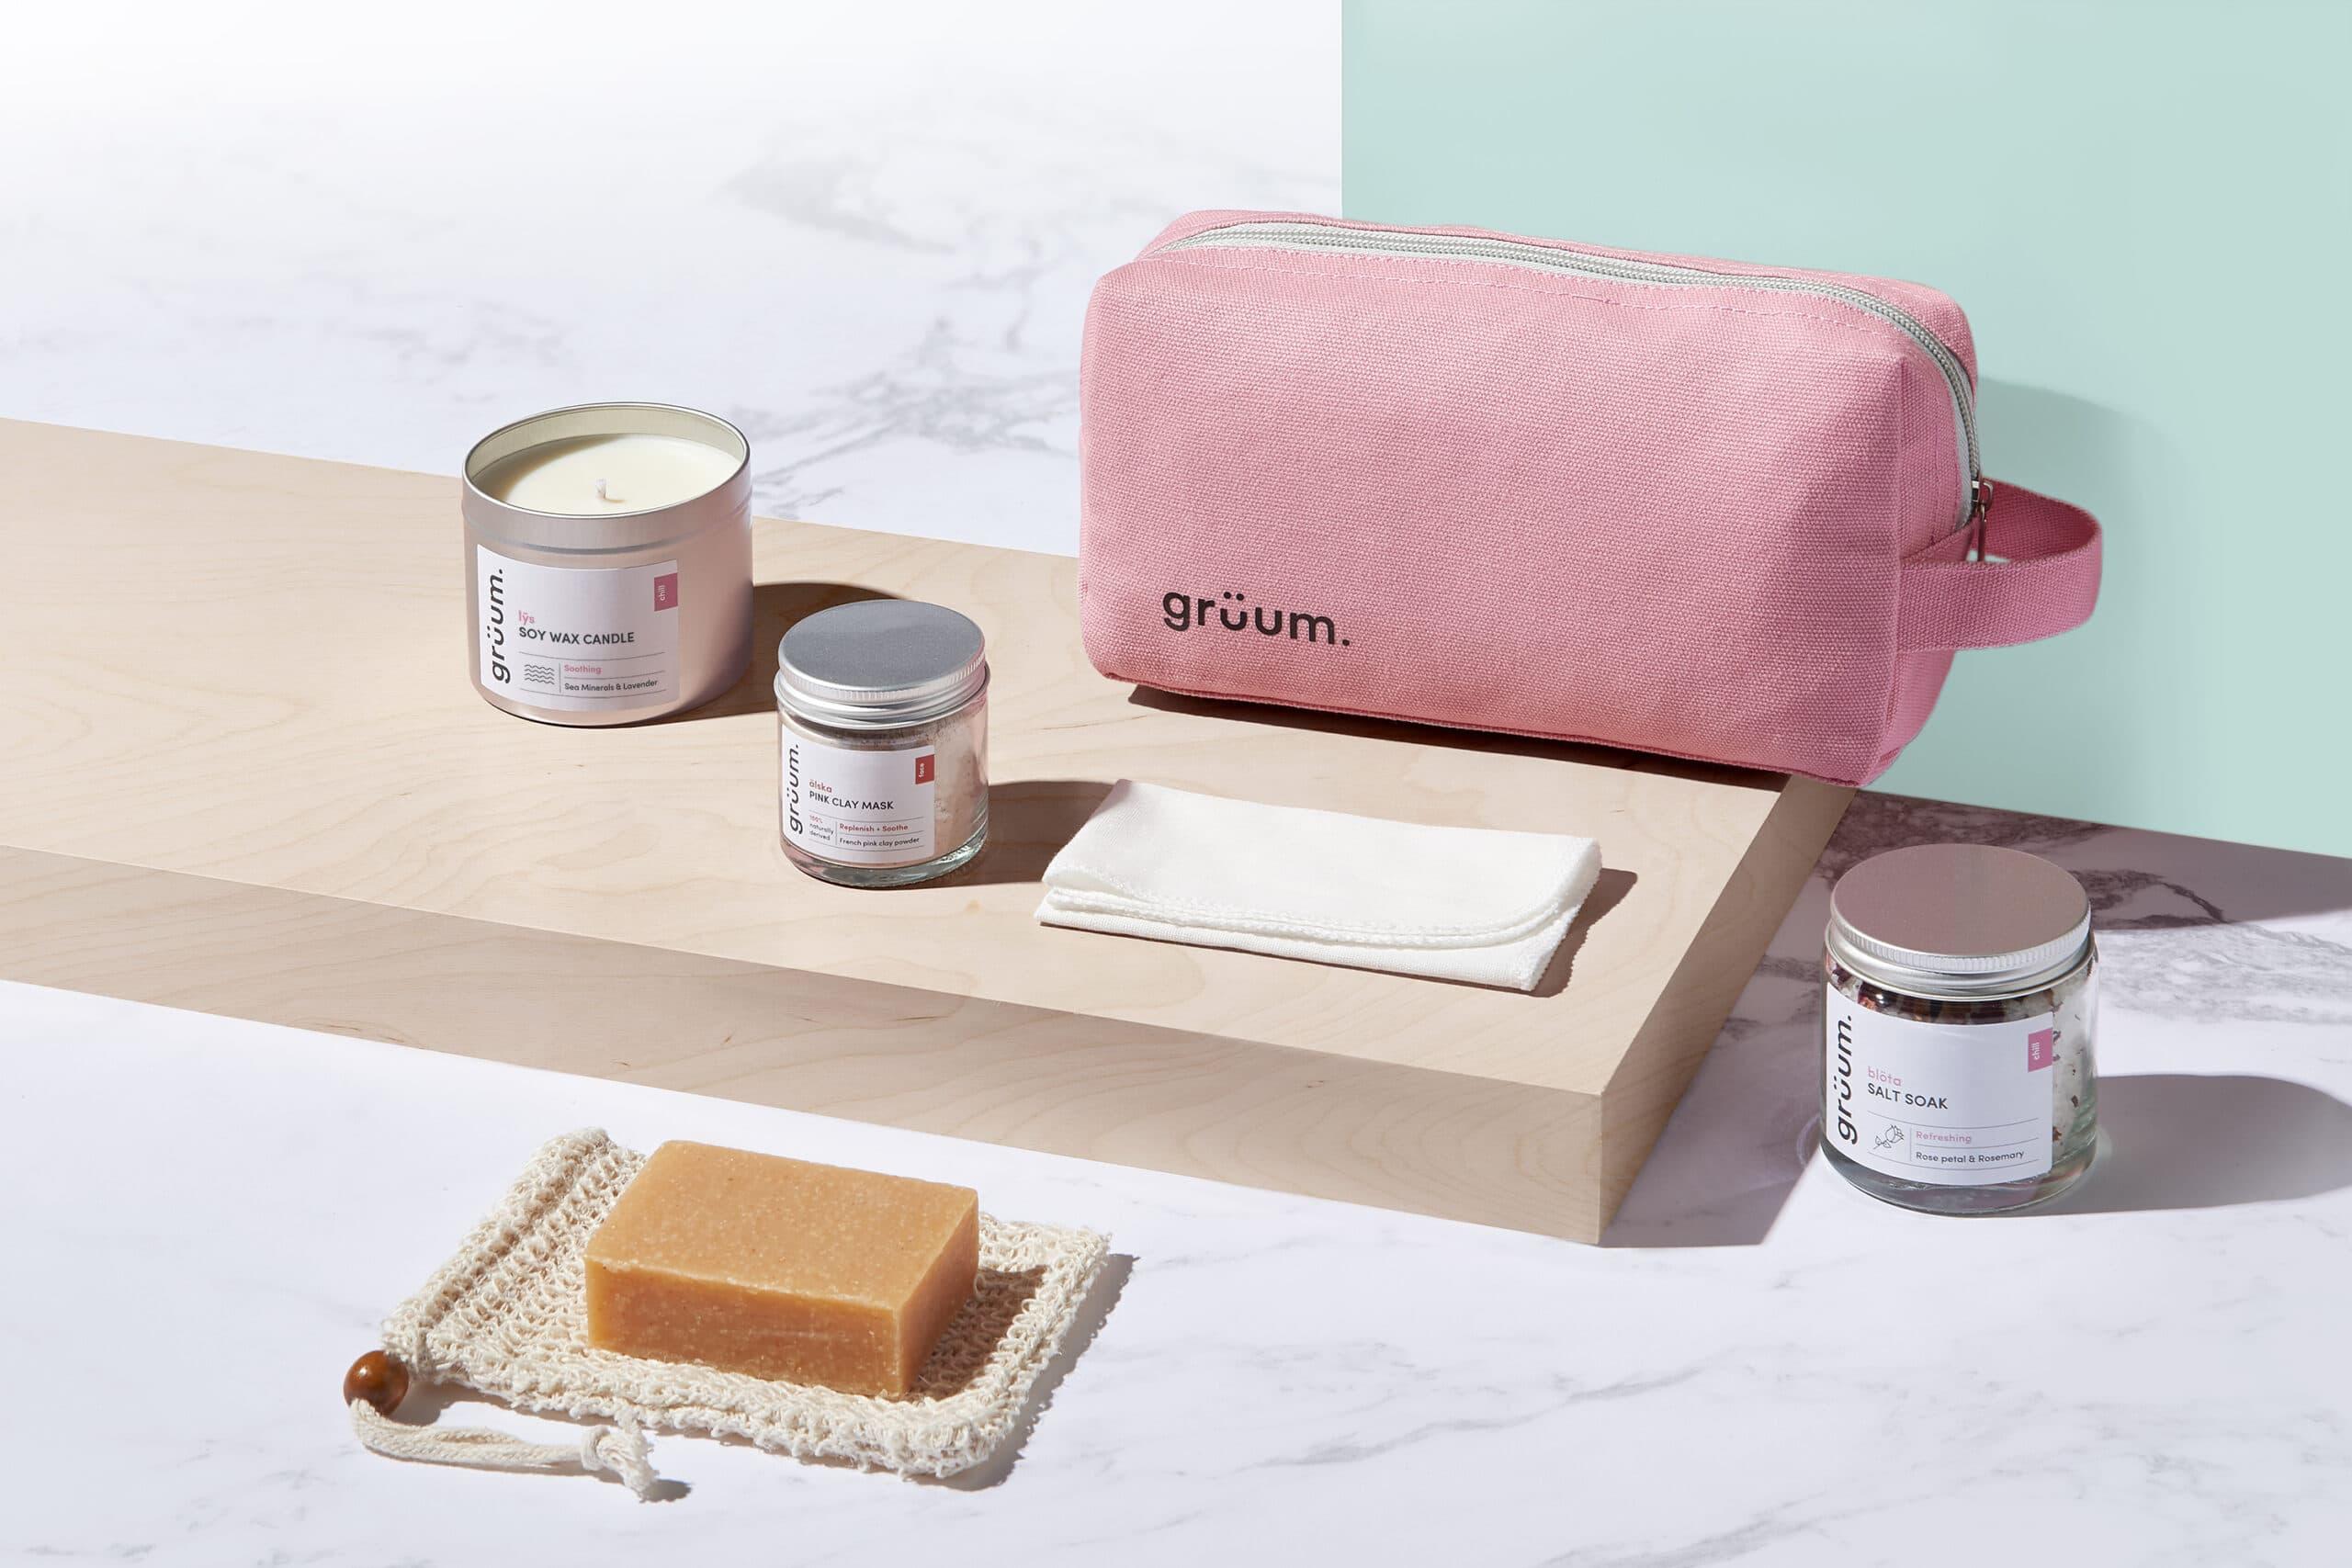 Gruum product image with washbag, soy wax candle, pink clay mask, bolta salt soak, body bar, sisal soap bag and muslin cloth